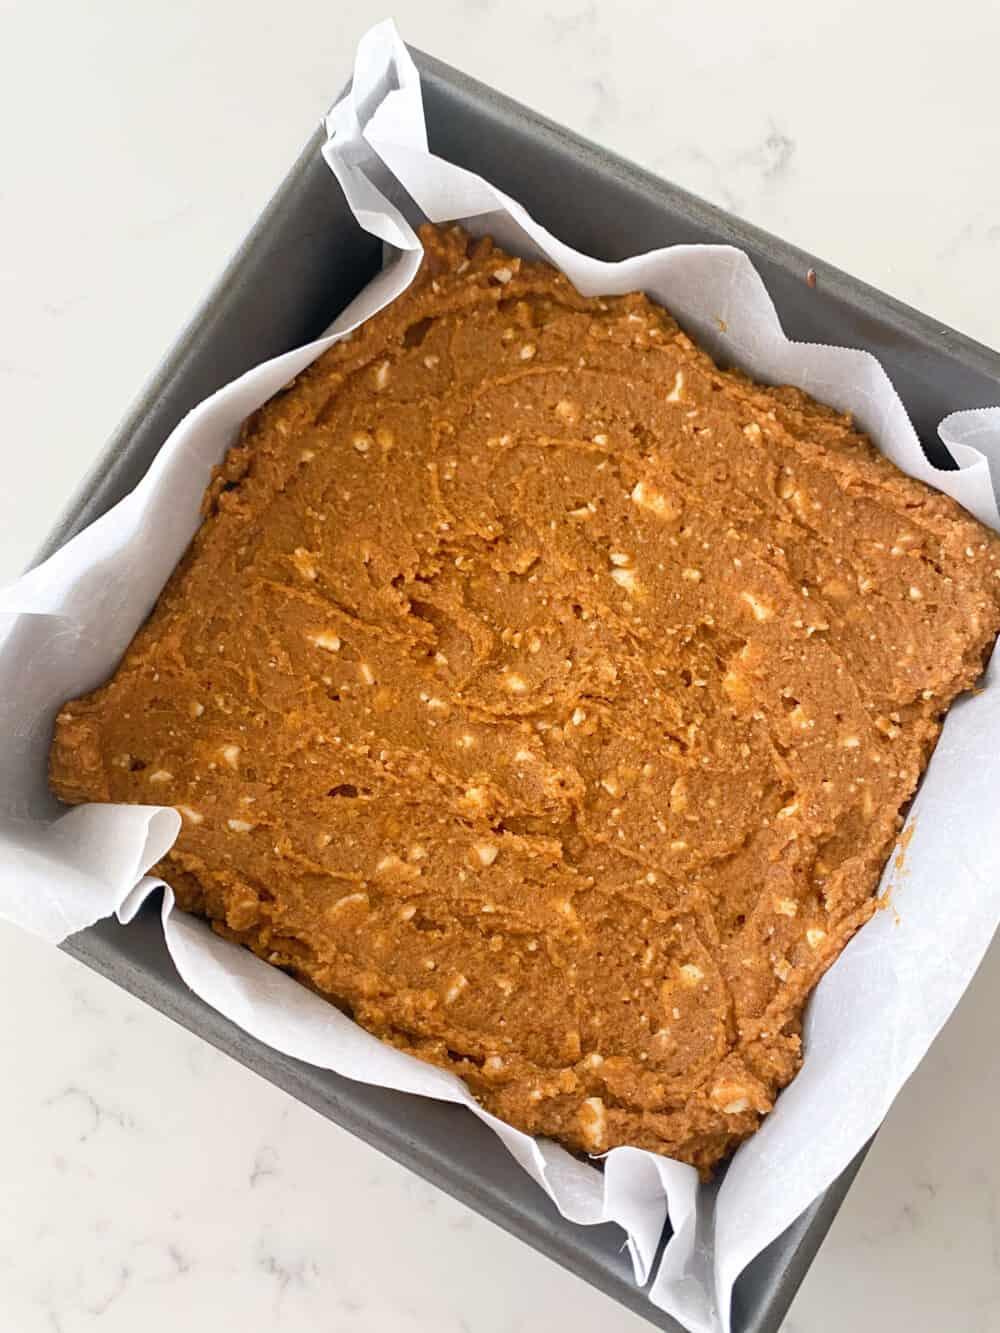 pumpkin blondies in baking dish ready to bake